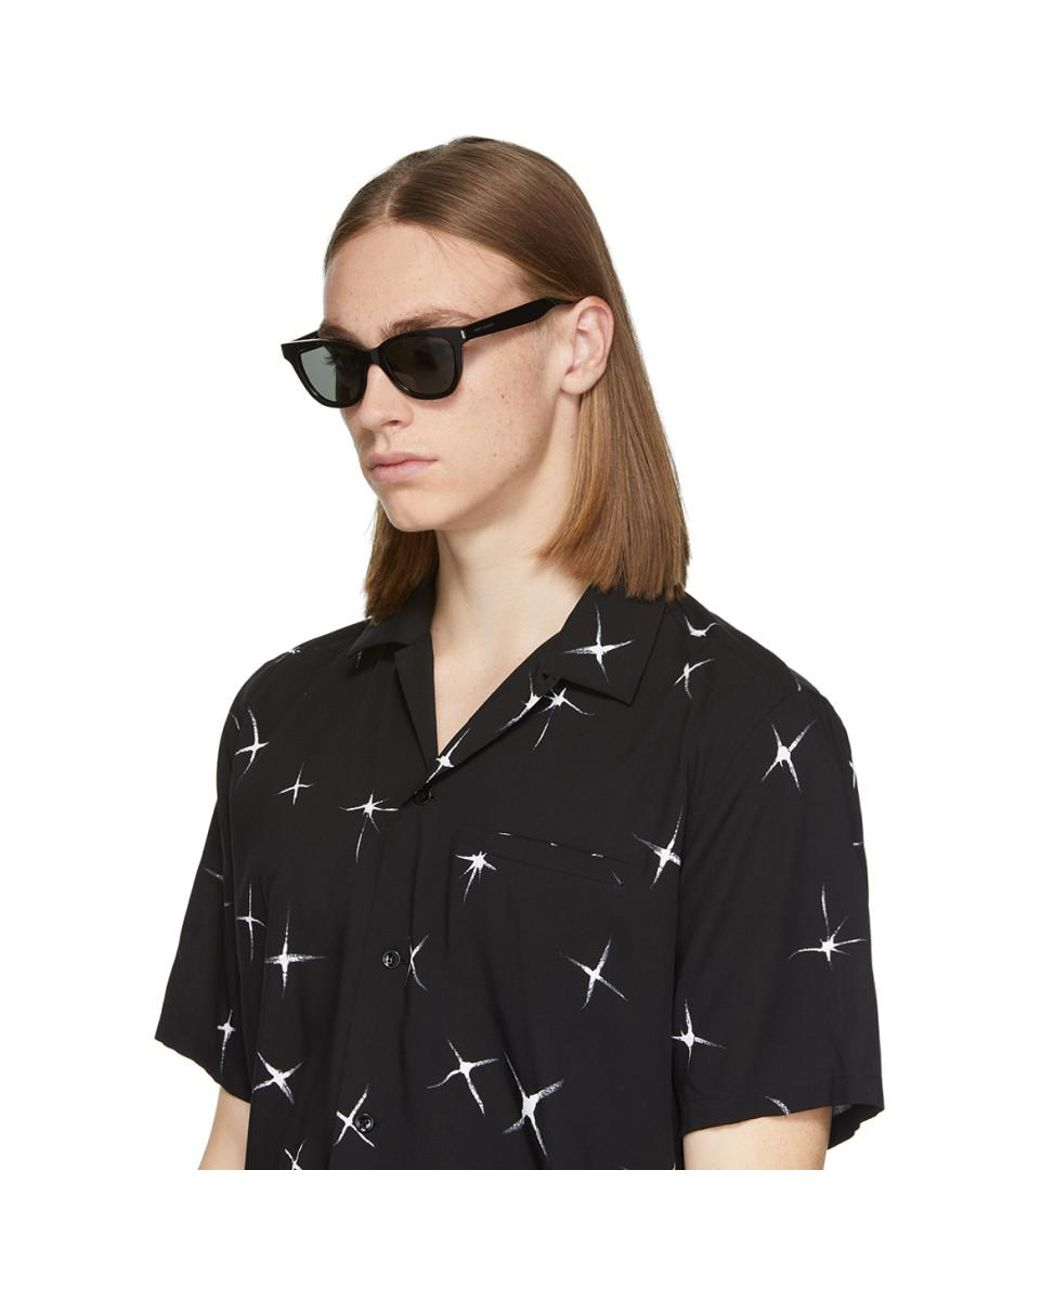 7473d22a28e8 Saint Laurent Black Small Sl 51 Sunglasses in Black for Men - Lyst